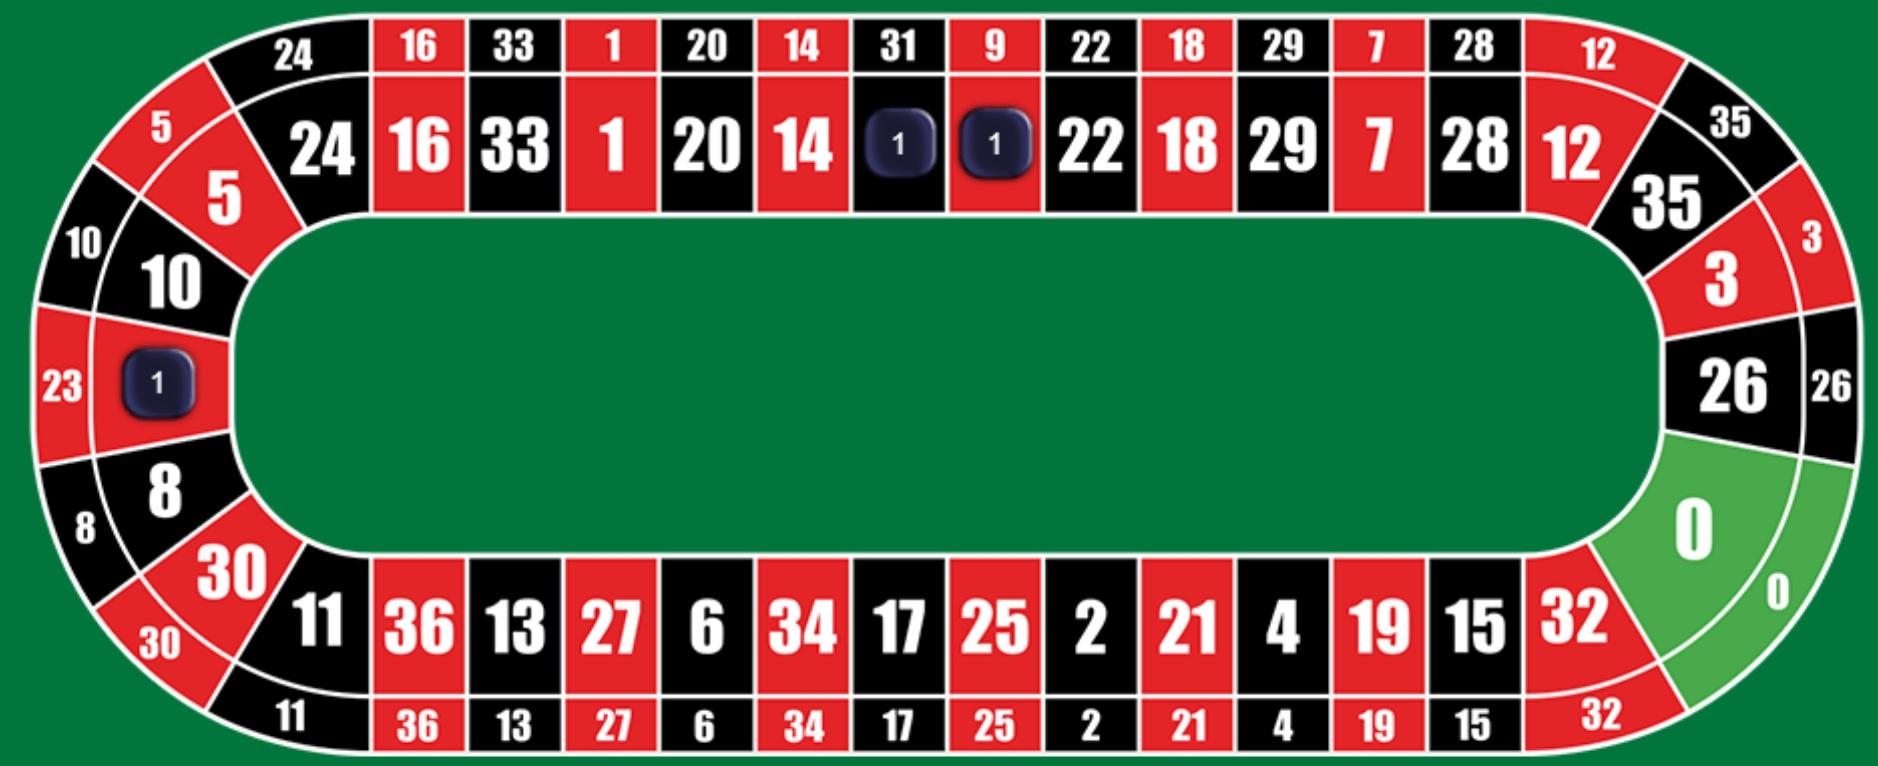 20p Roulette Review